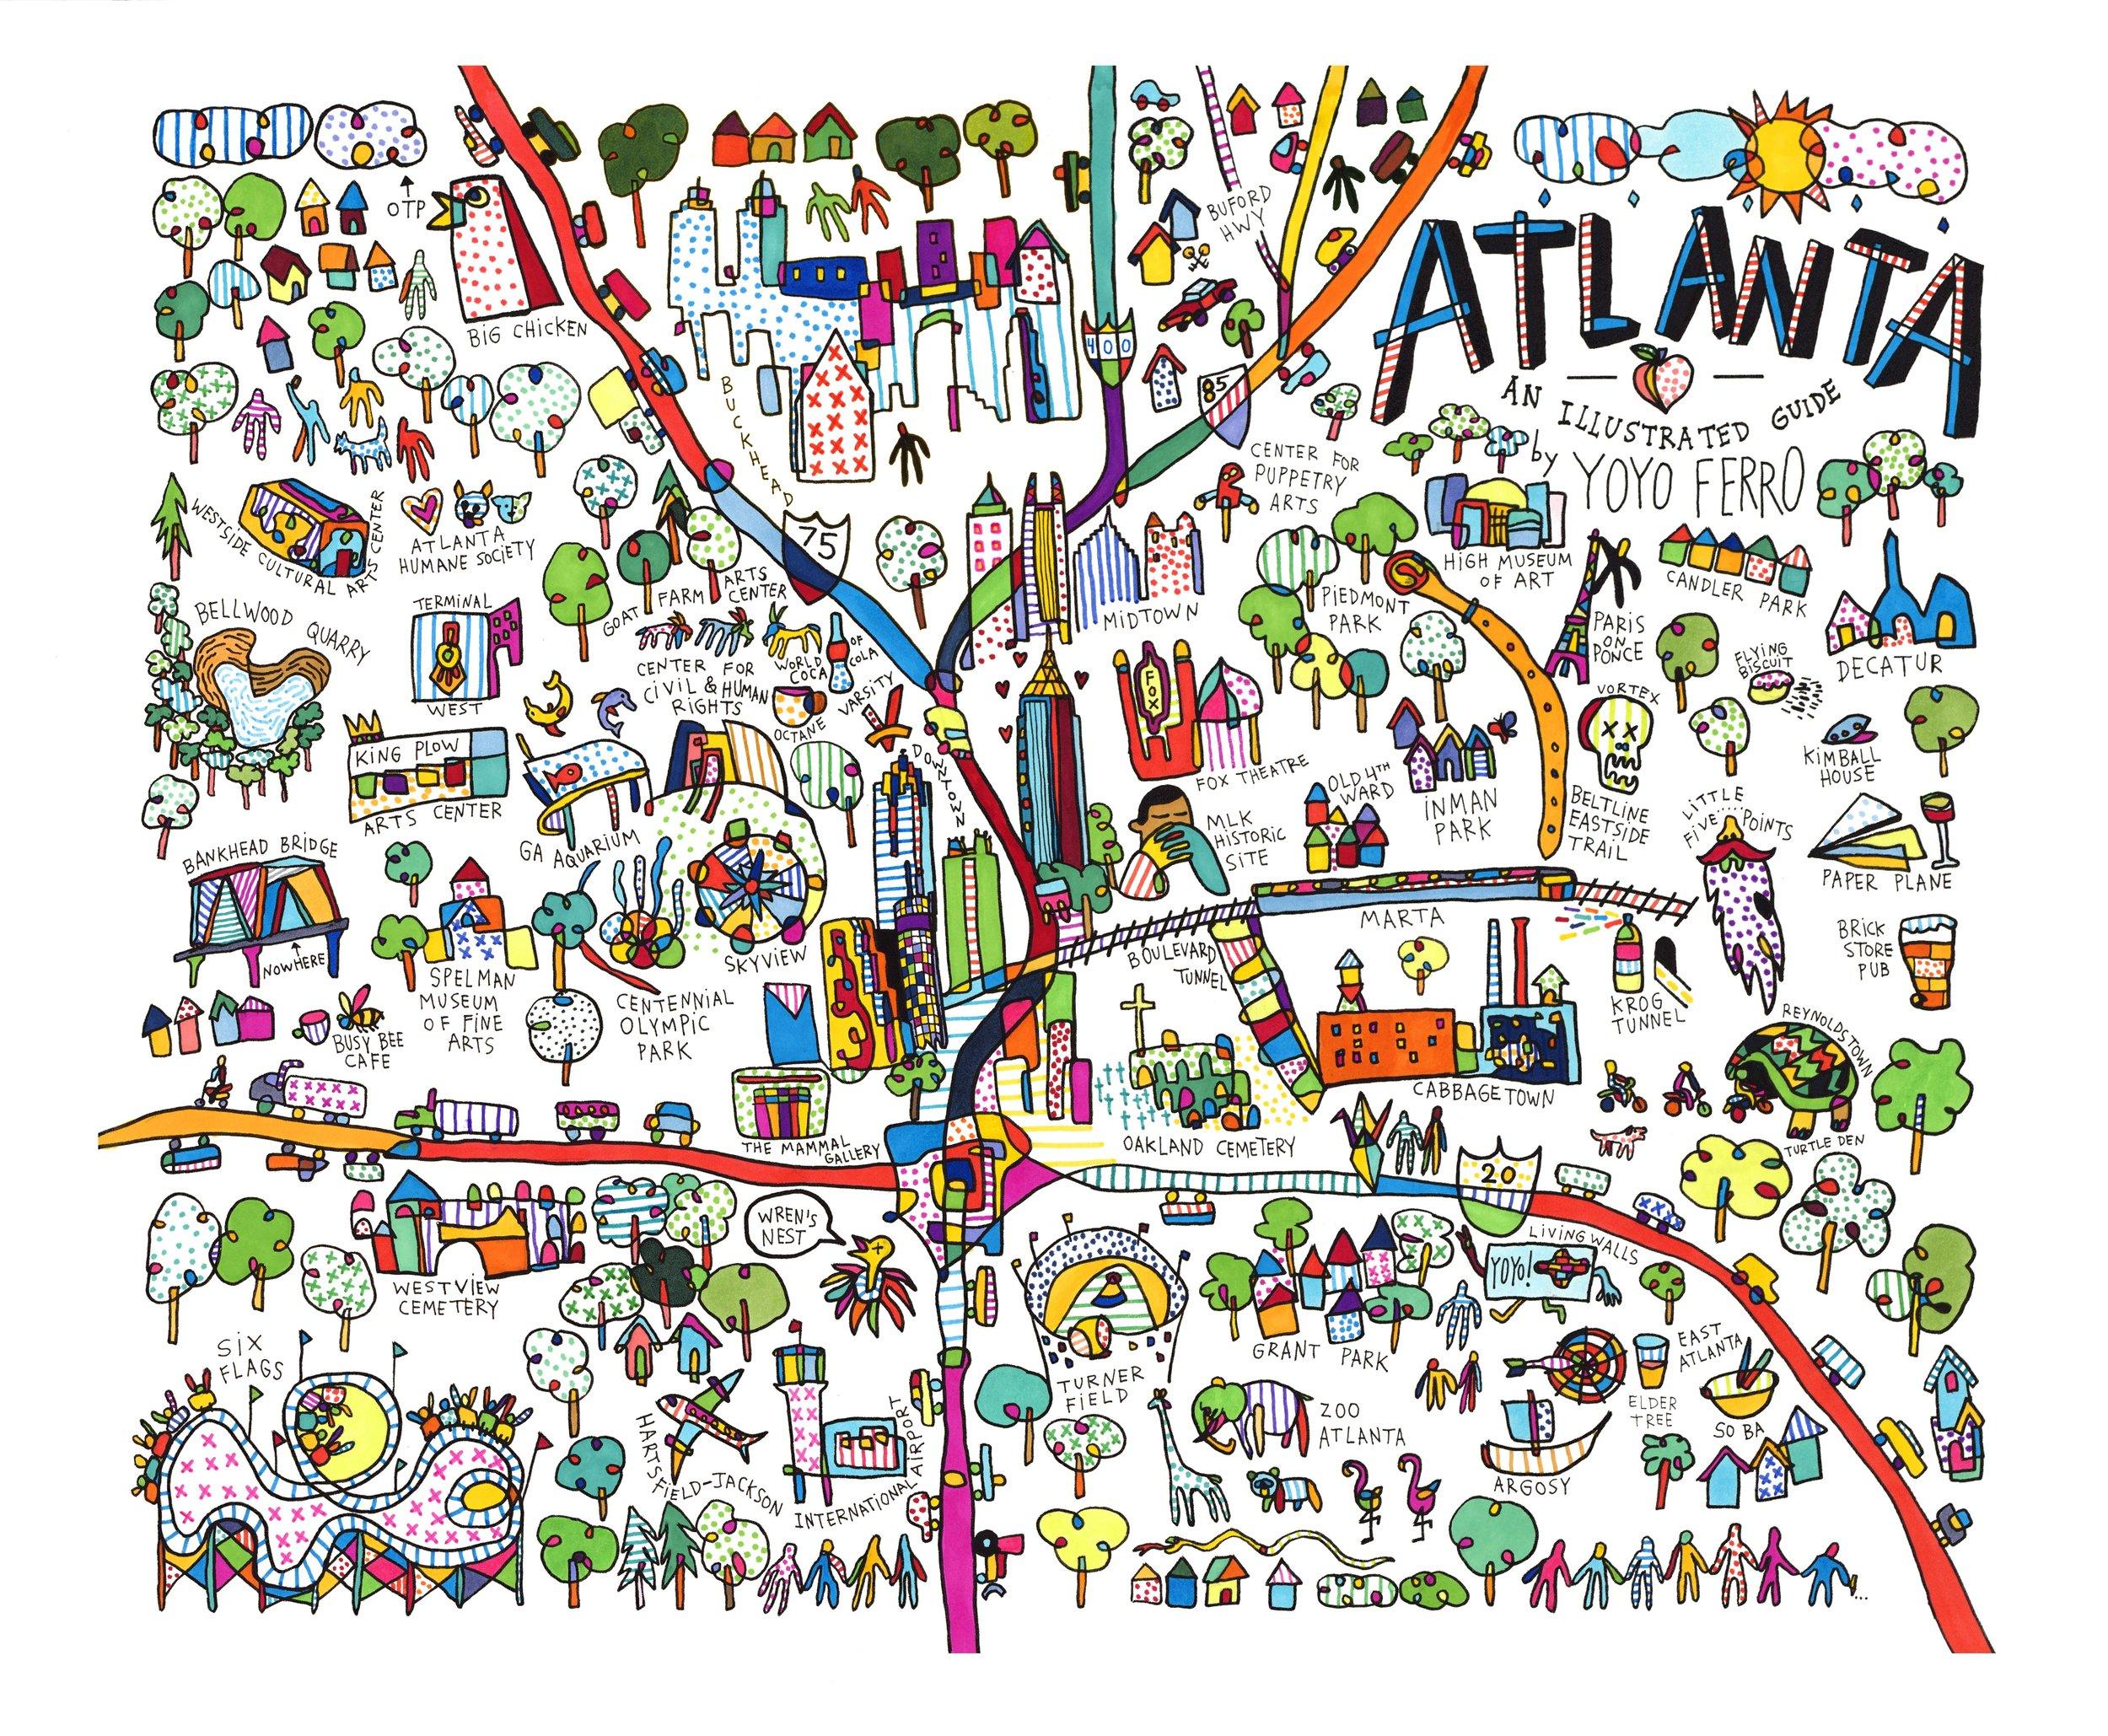 Atlanta Map for    Creative Loafing Atlanta  , 2015   BUY PRINT